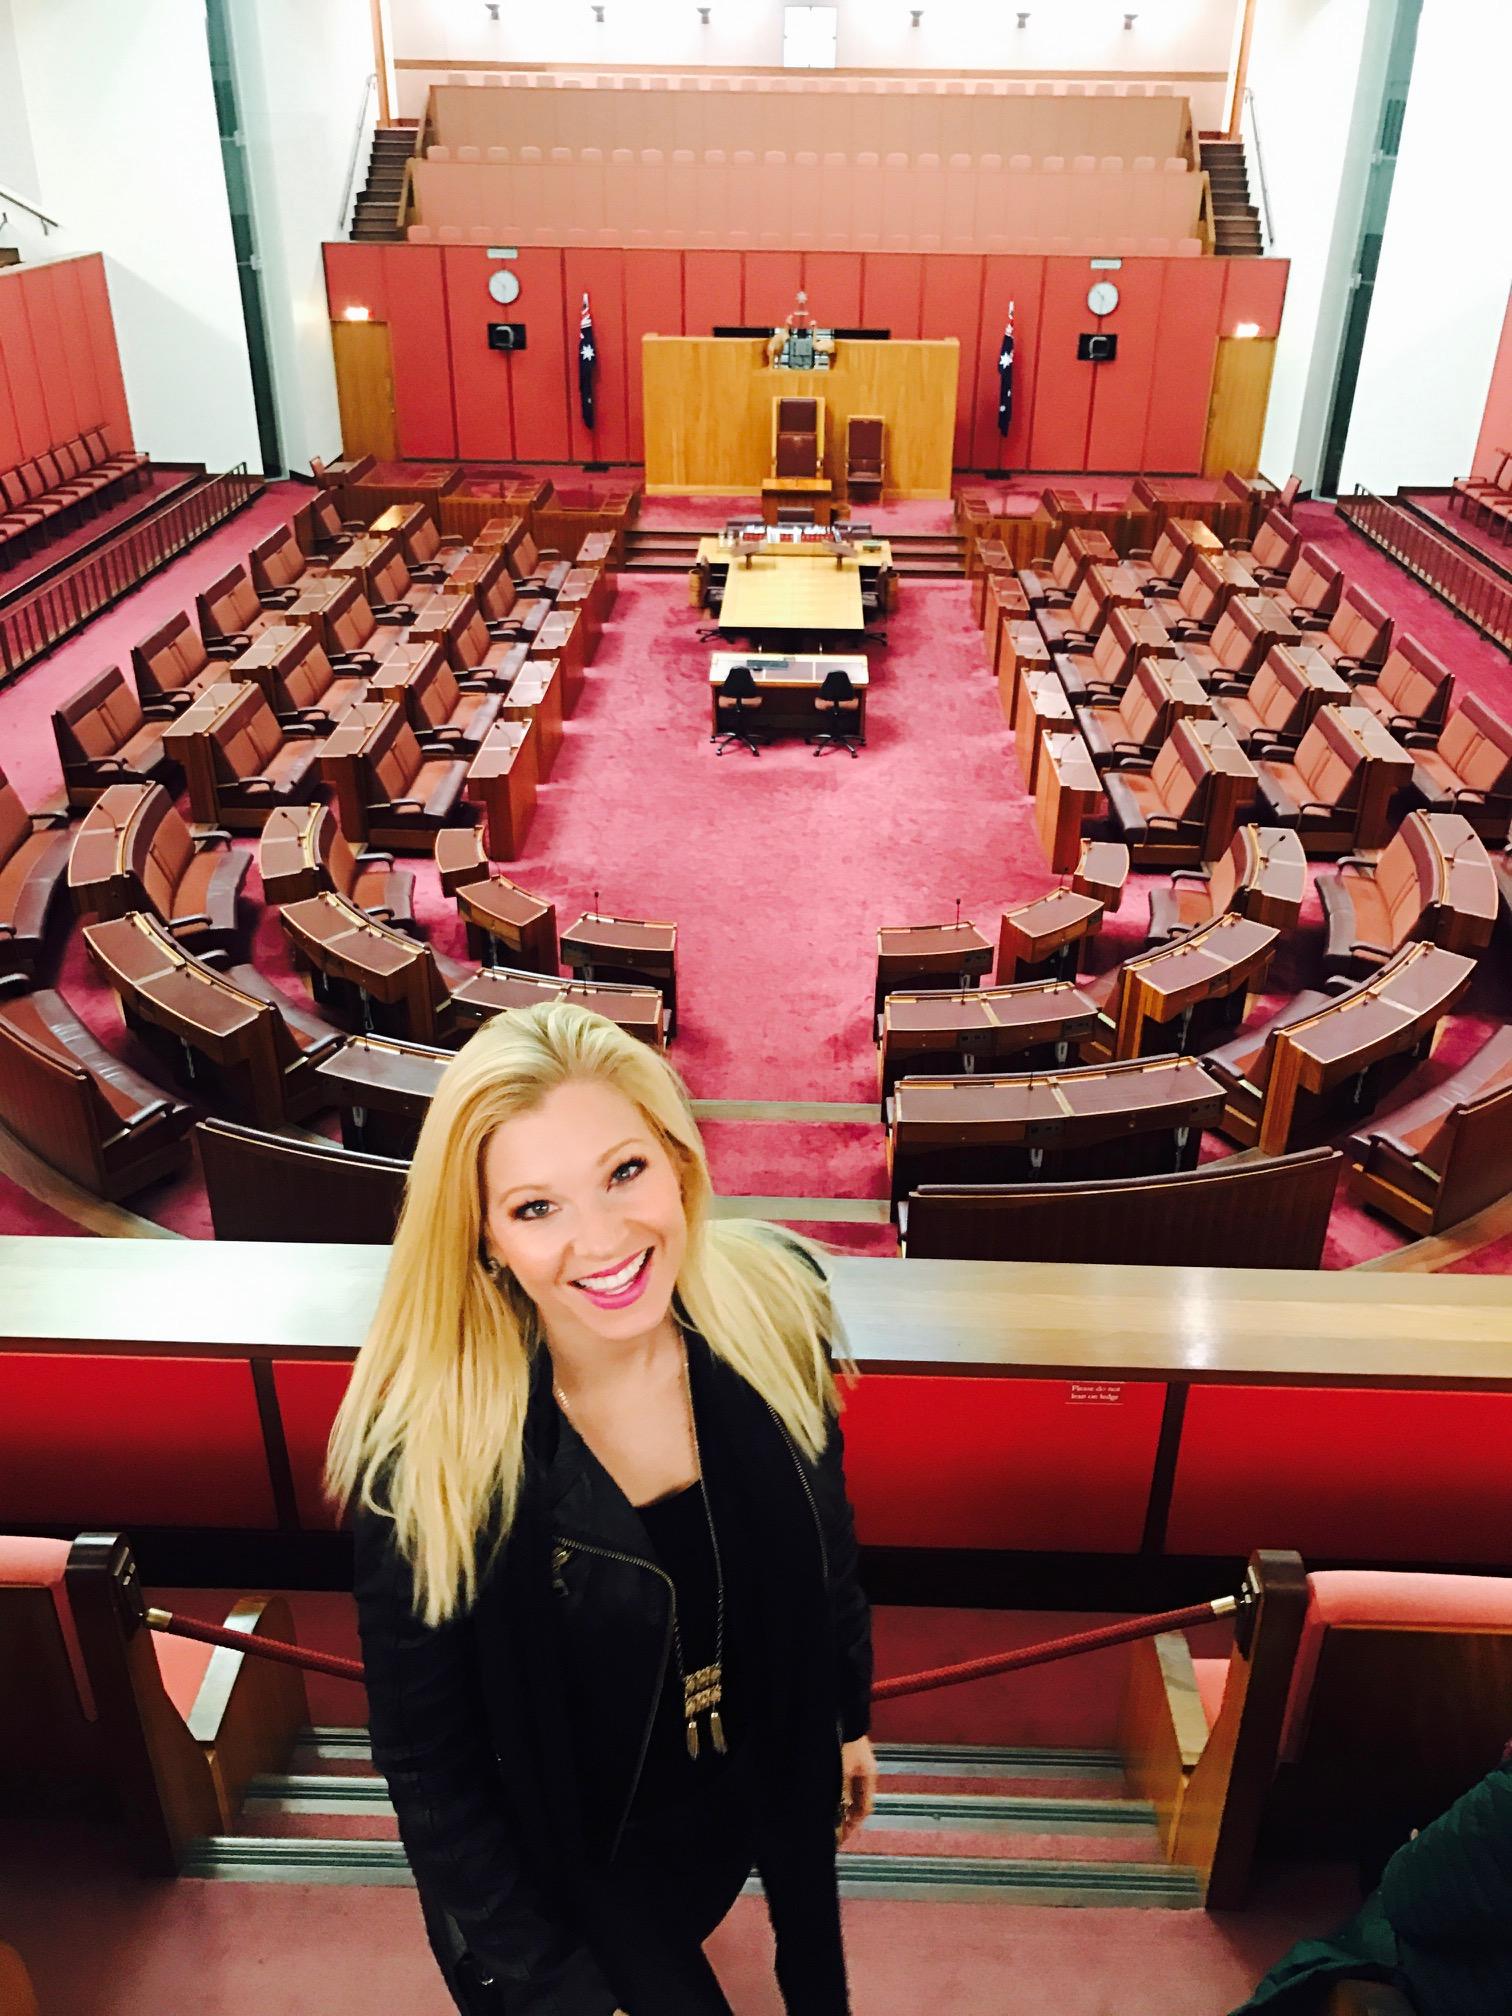 Anna Kooiman parliament house Australia annakooiman.com